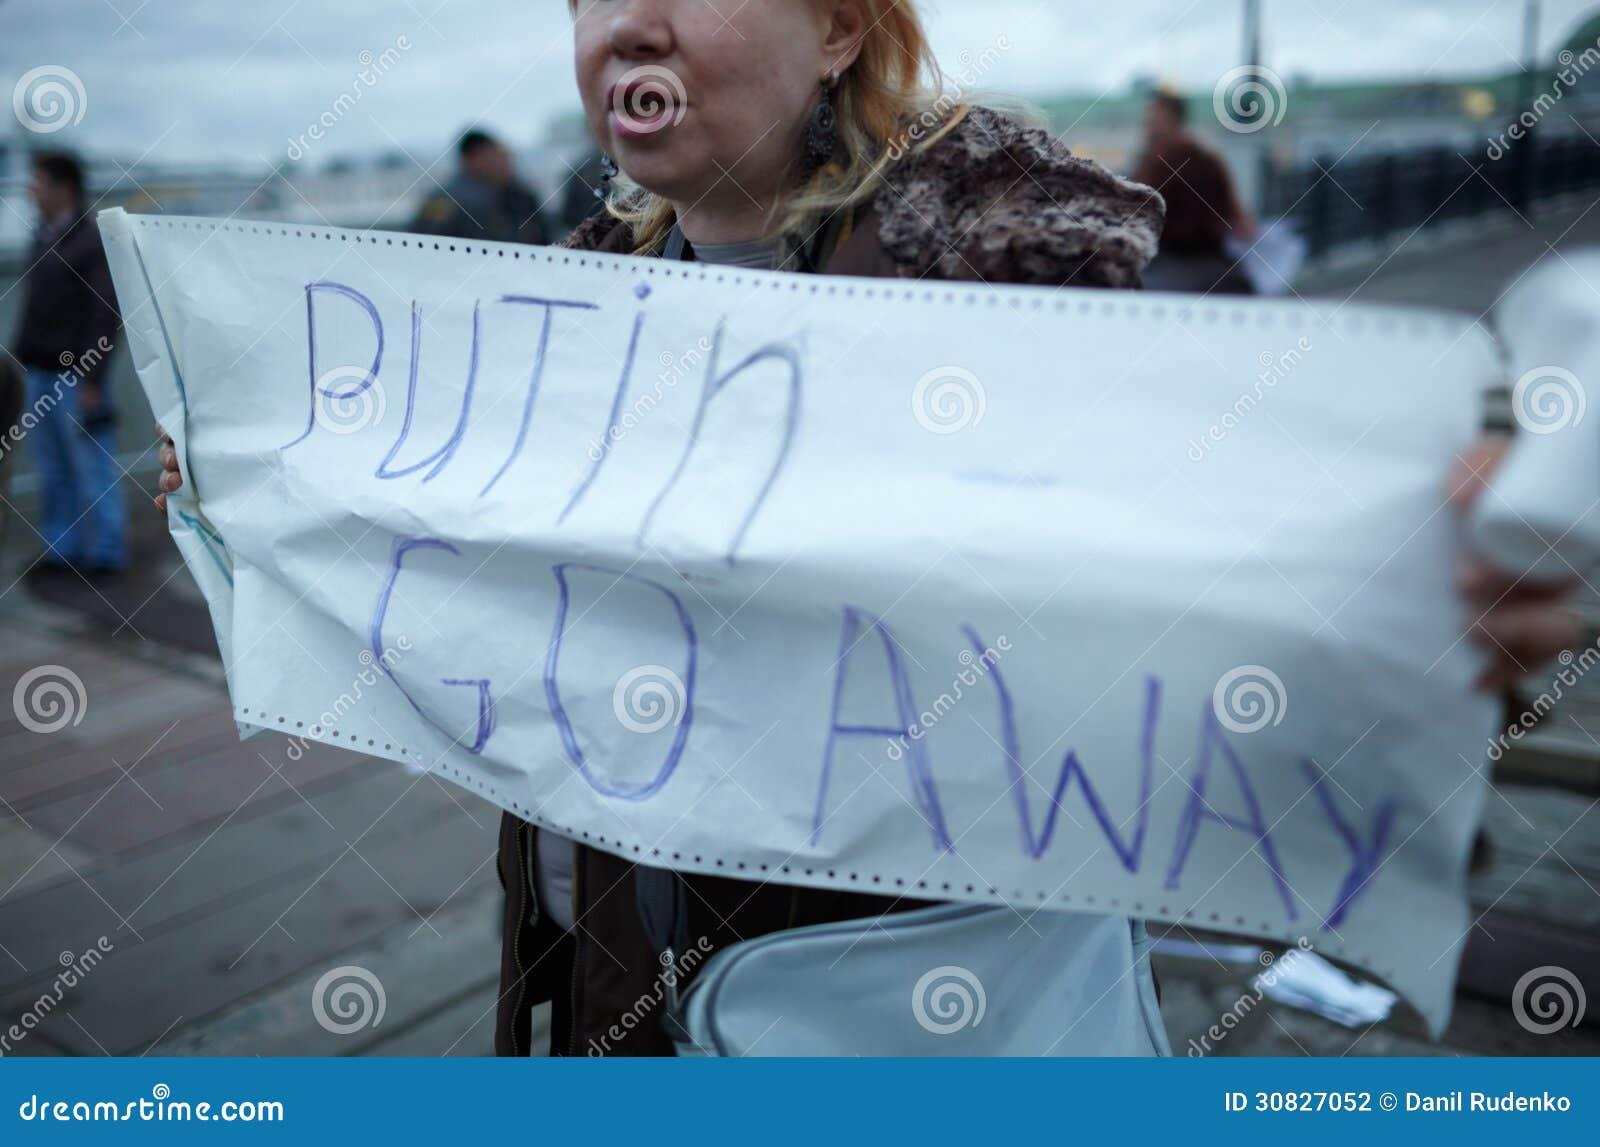 La donna tiene un cartello Putin va via.